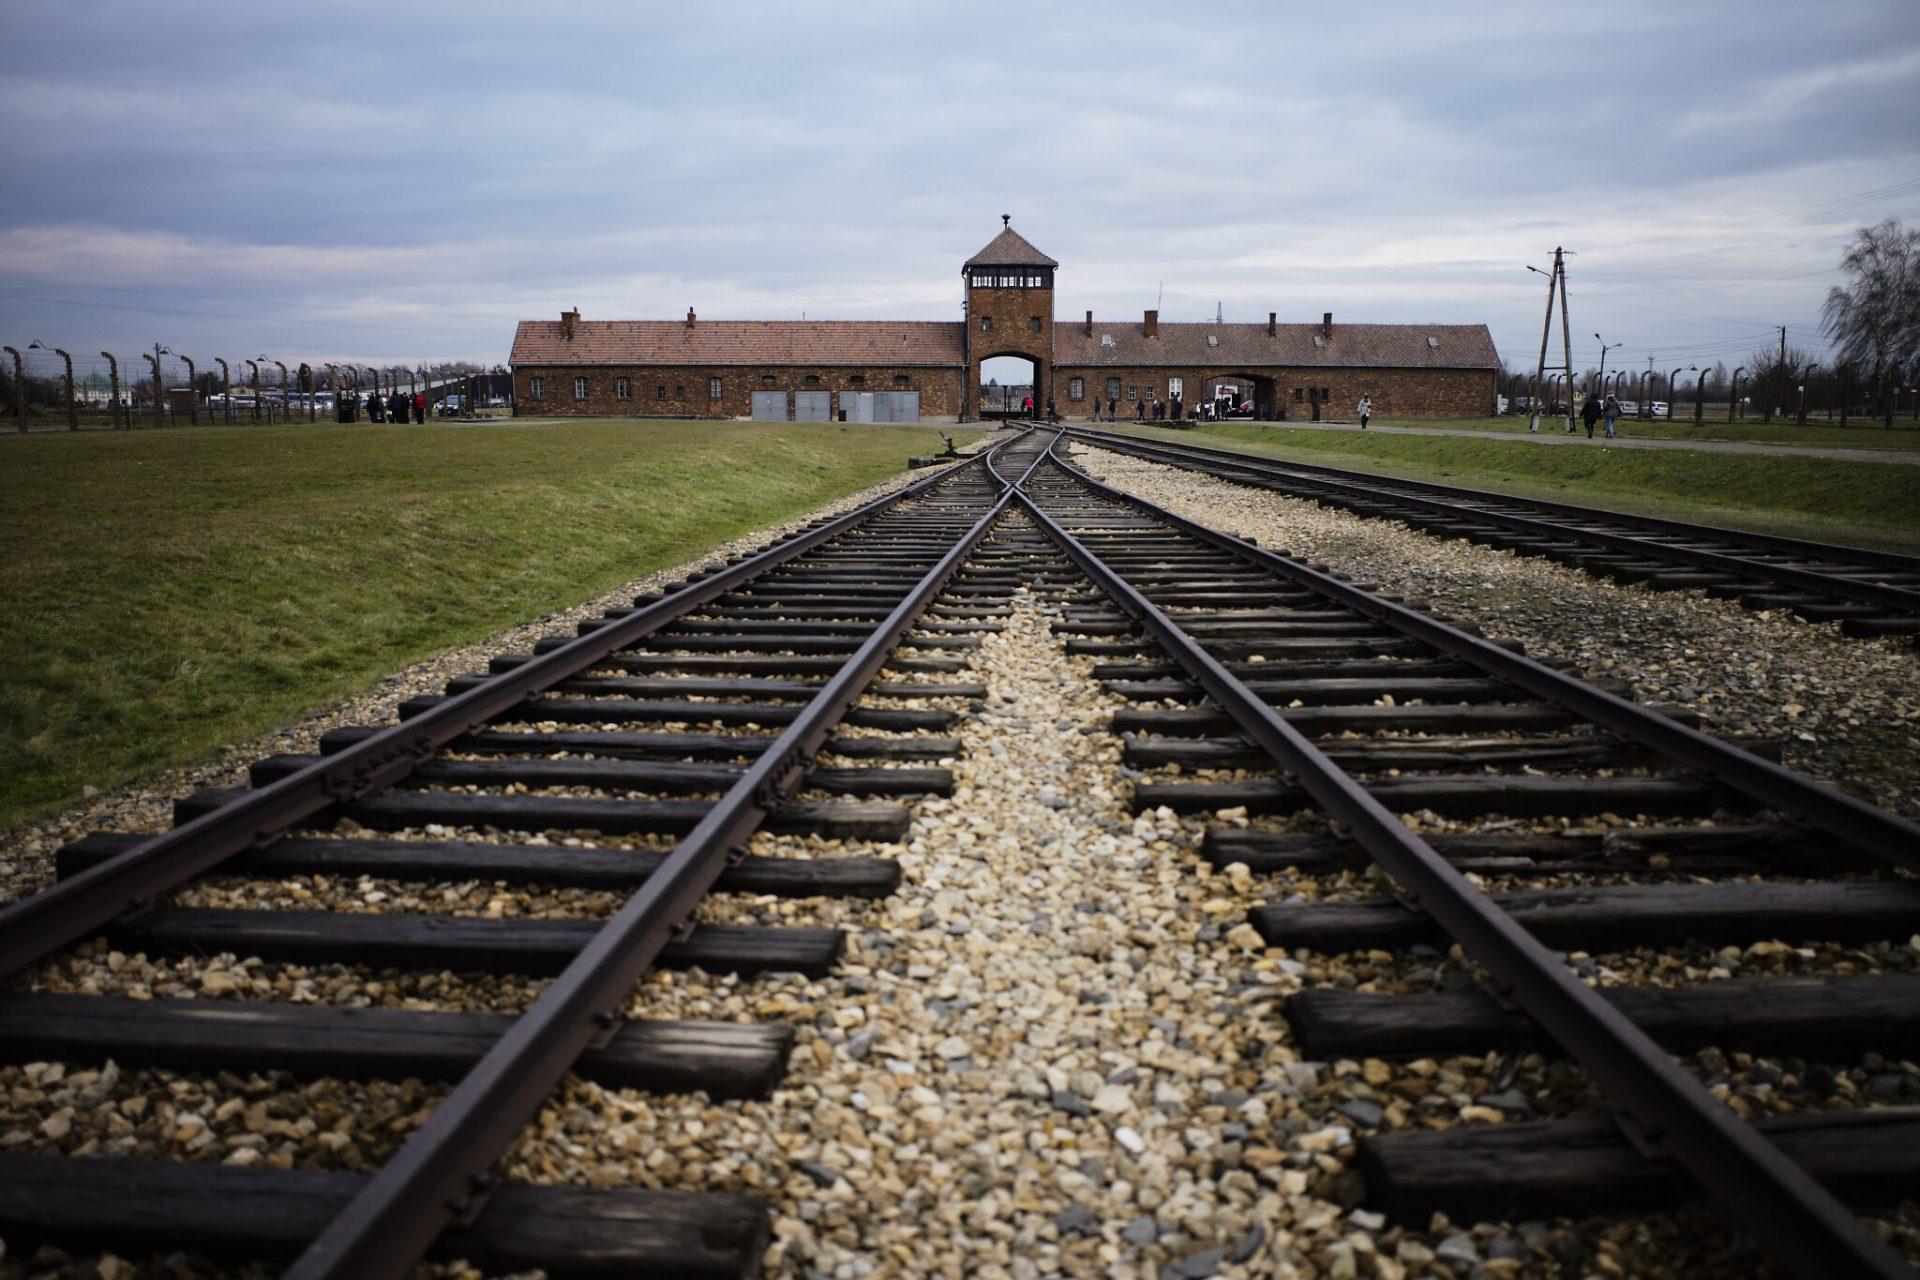 Muzeul de stat Auschwitz critică dur un articol publicat de New Yorker